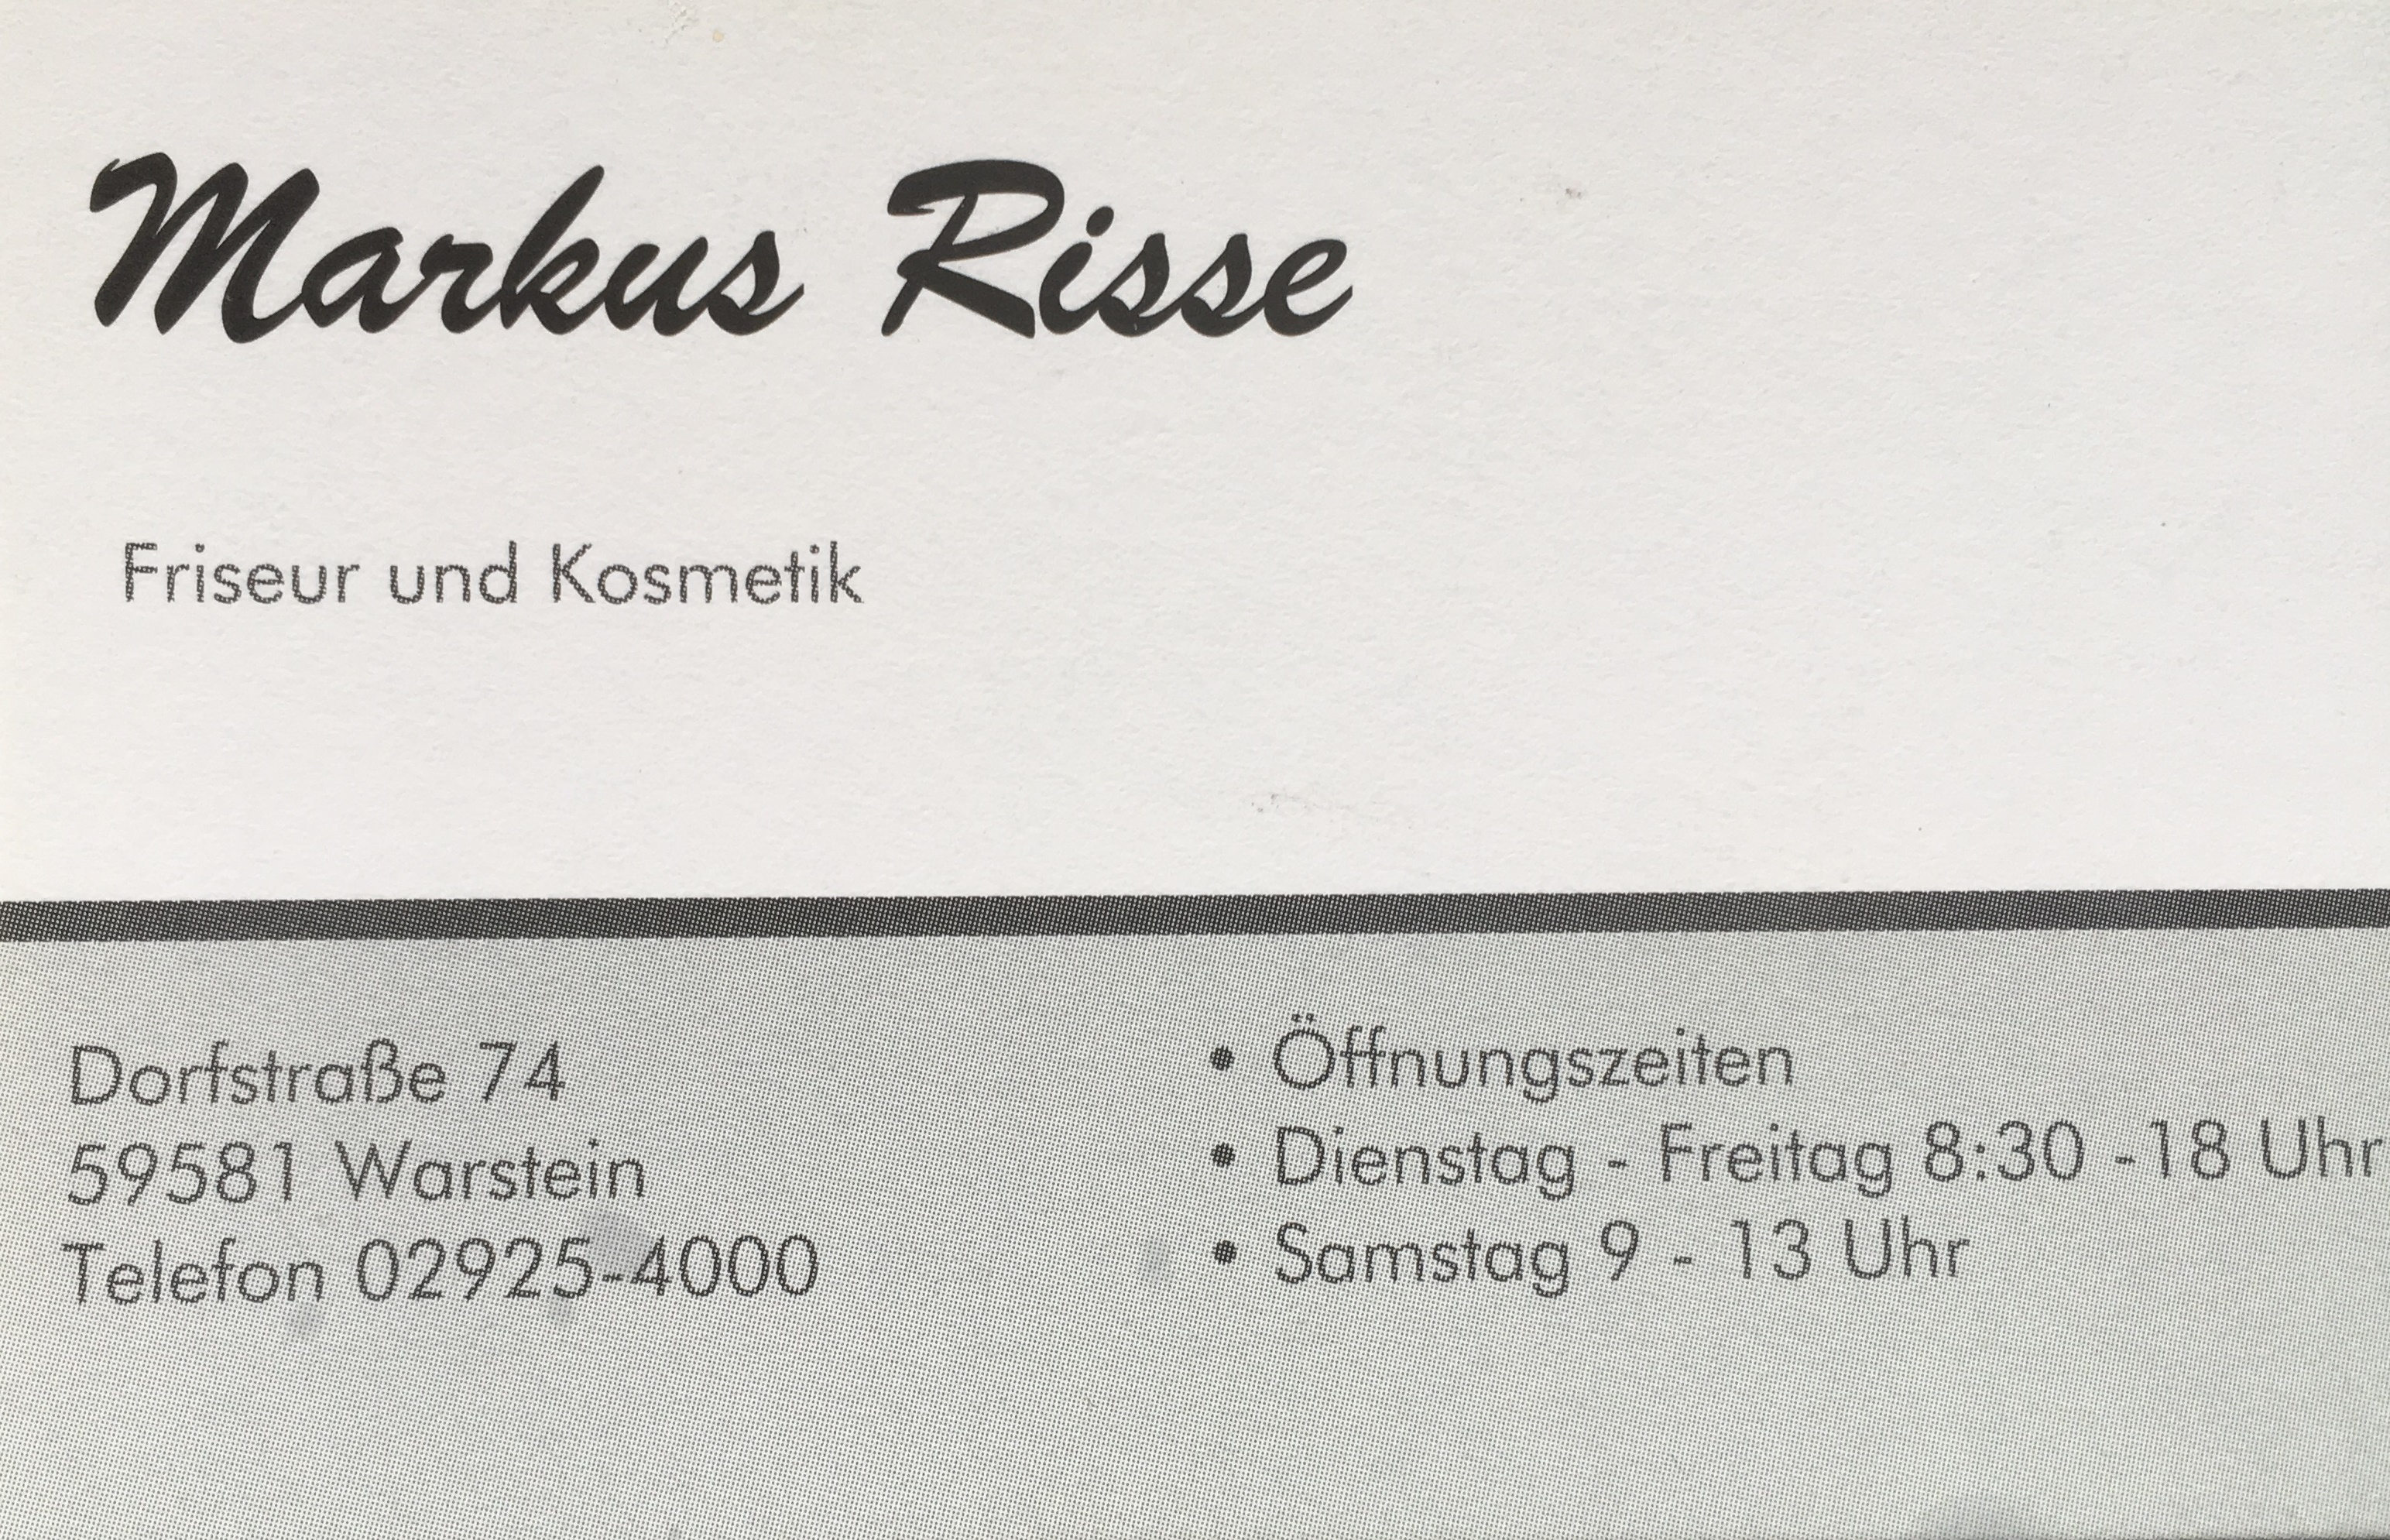 Markus Risse Friseur & Kosmetik